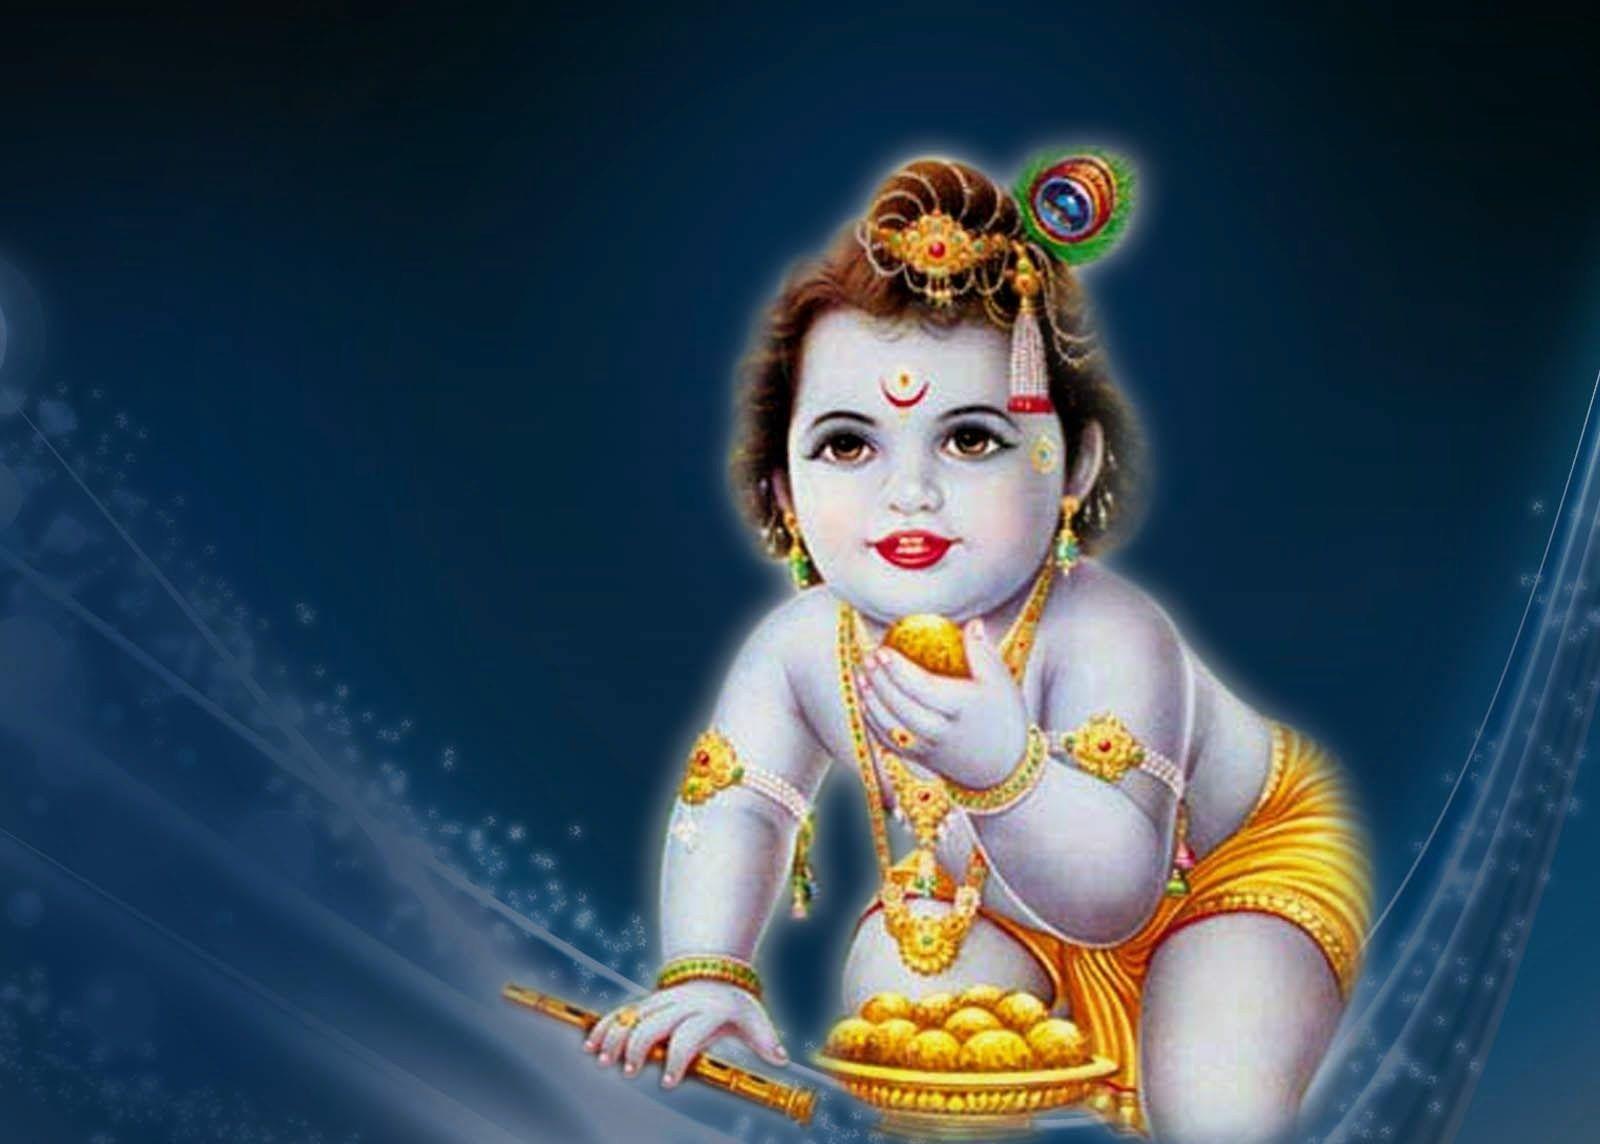 Lord shree bal krishna wallpaper beautiful hd wallpaper - Super Cute Images Of Bal Gopal Krishna Everyone Will Love